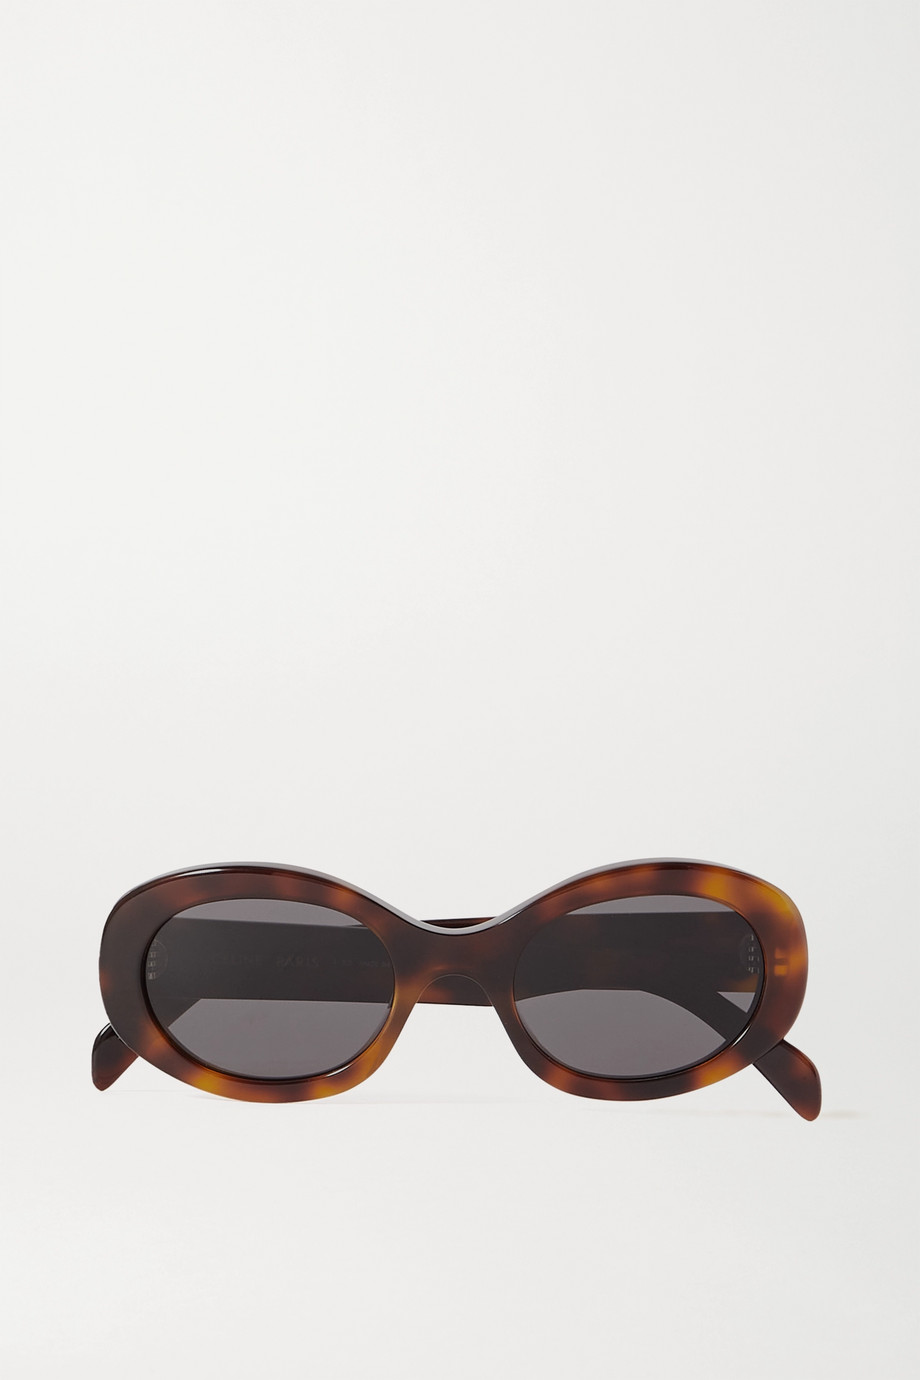 CELINE Eyewear Sonnenbrille mit ovalem Rahmen aus Azetat in Hornoptik